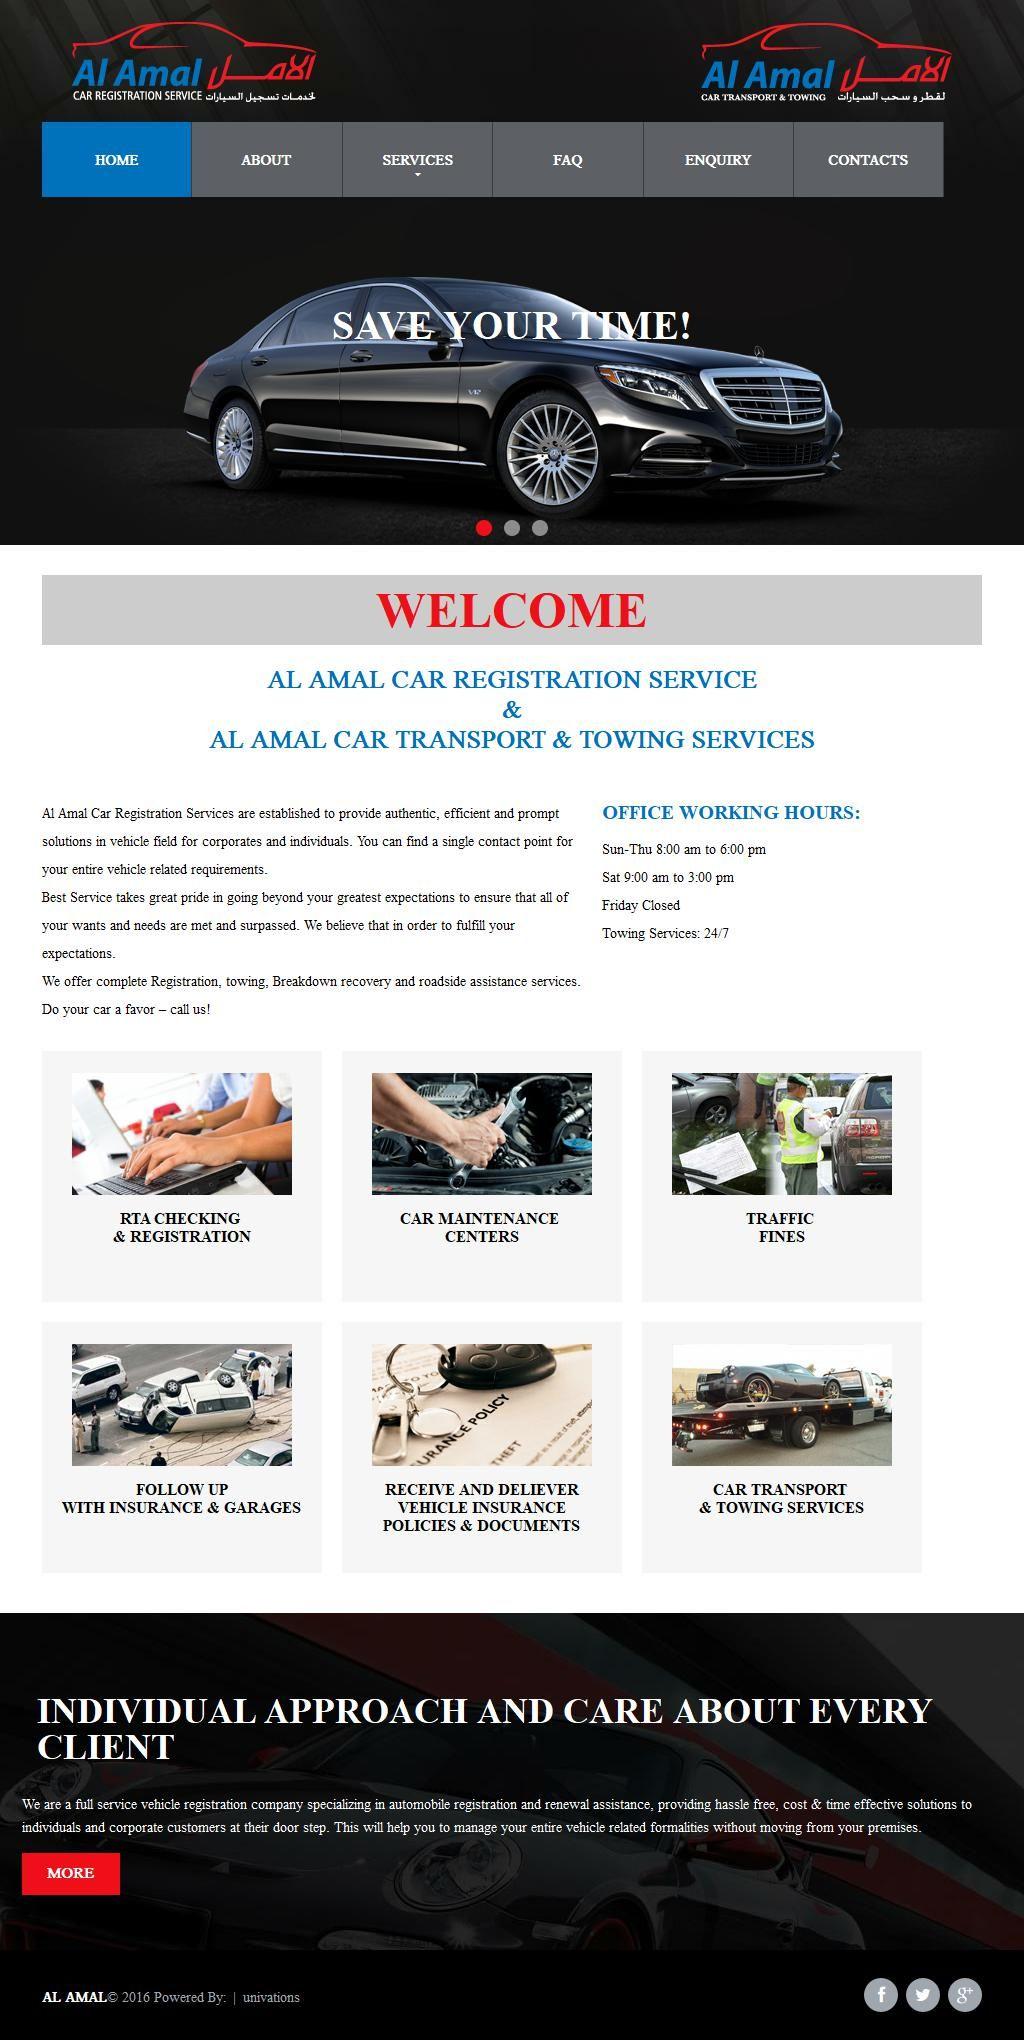 Al Amal Car Registration Company Saheel Tower 2, 26, Al